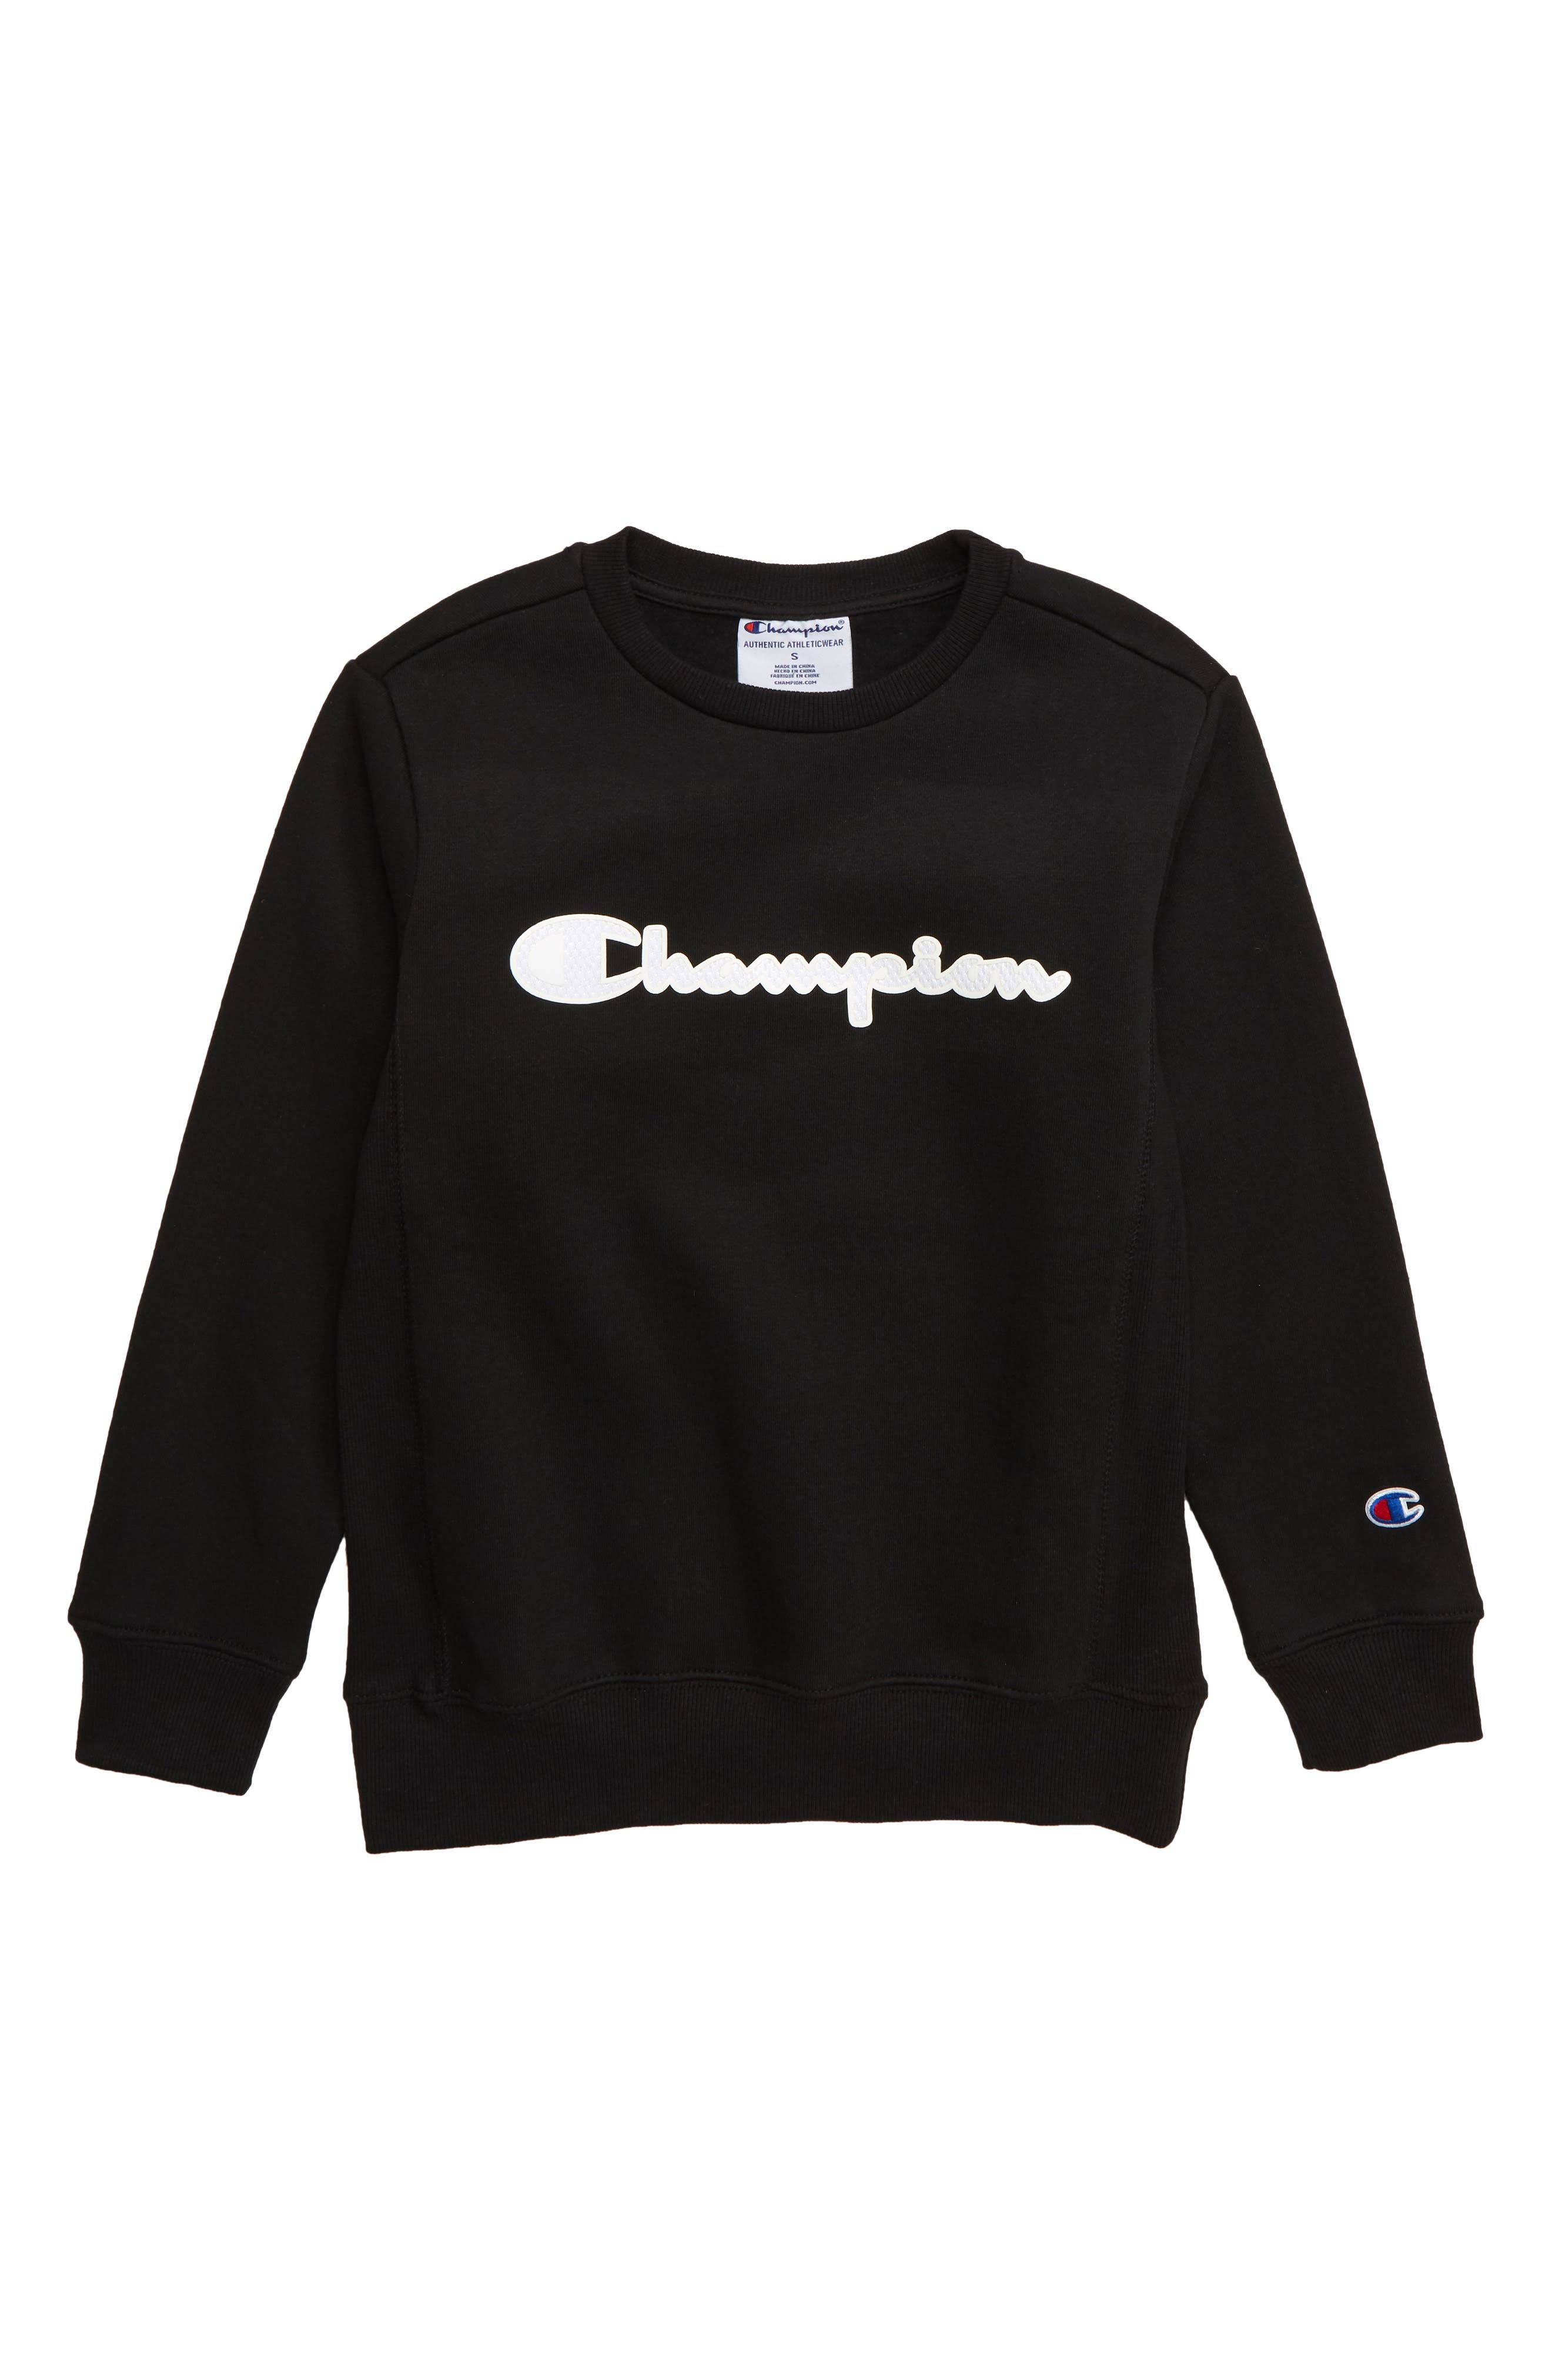 CHAMPION, Premium Fleece Crewneck Sweatshirt, Main thumbnail 1, color, BLACK